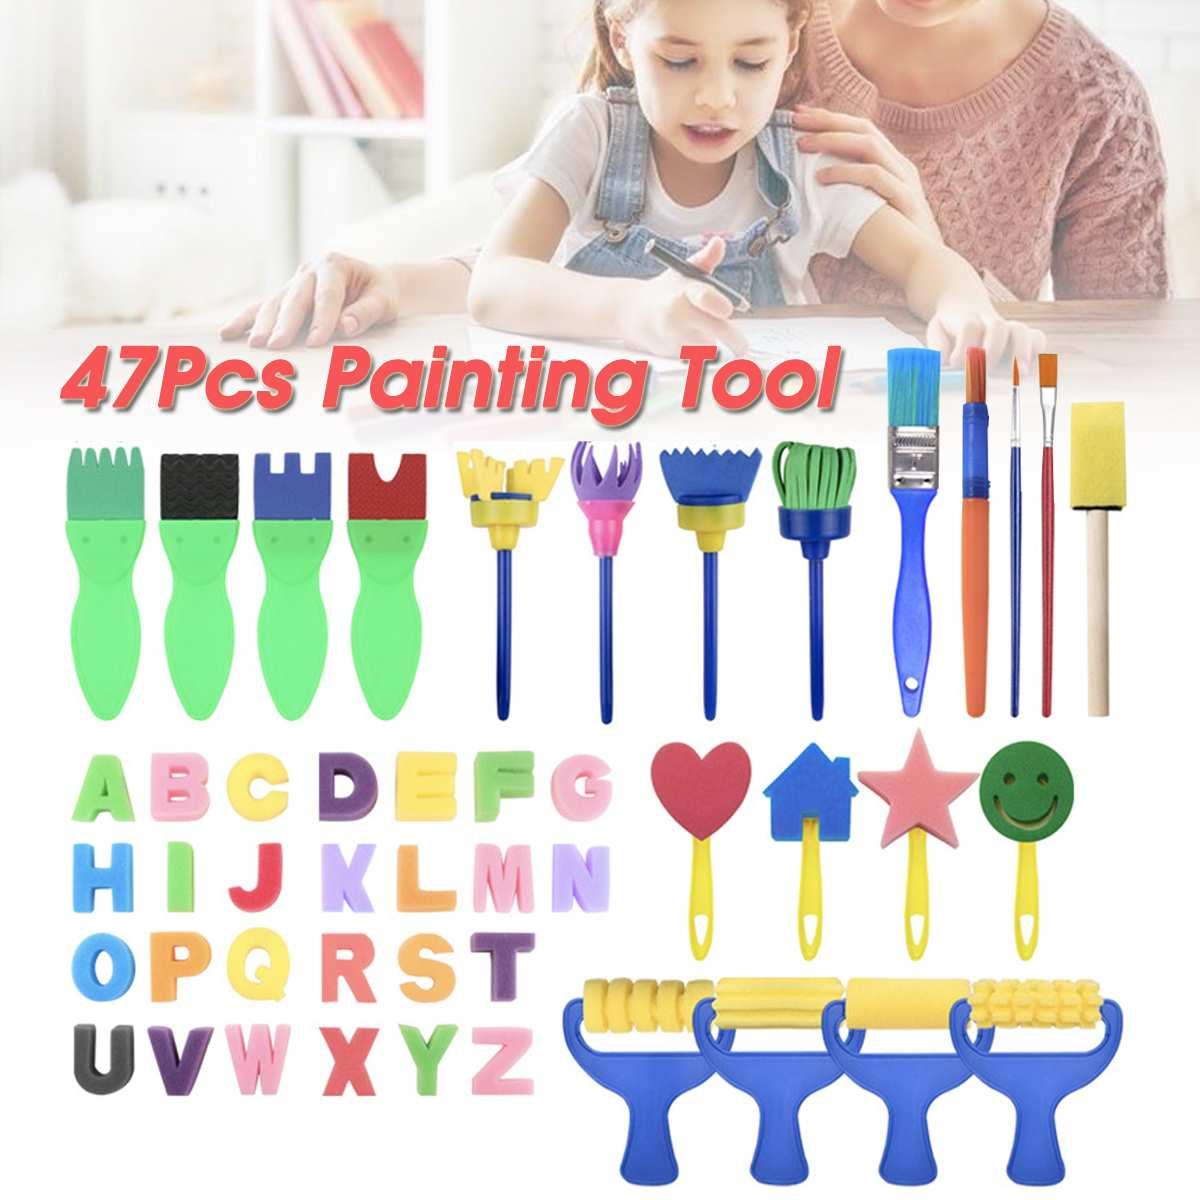 47pcs/set Diy Child Painting Tool Kit Roller Mold Sponge Drawing Writing Brush Mini Pattern Mold Toy Kids Gifts Merry Christmas